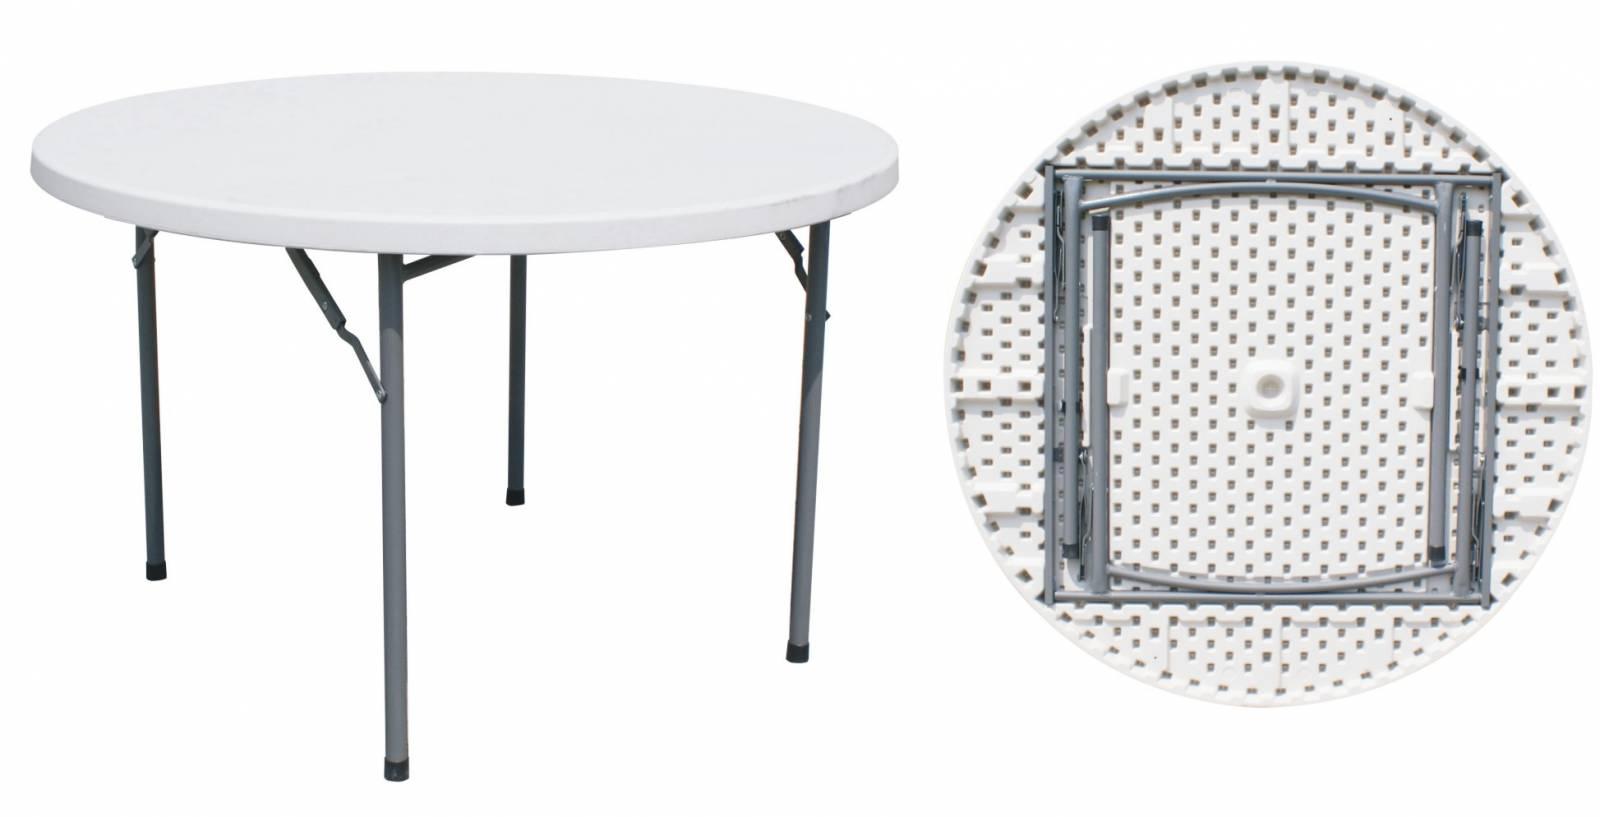 Inklapbare tafel 120 amedi totaalinrichting for Inklapbare tafel